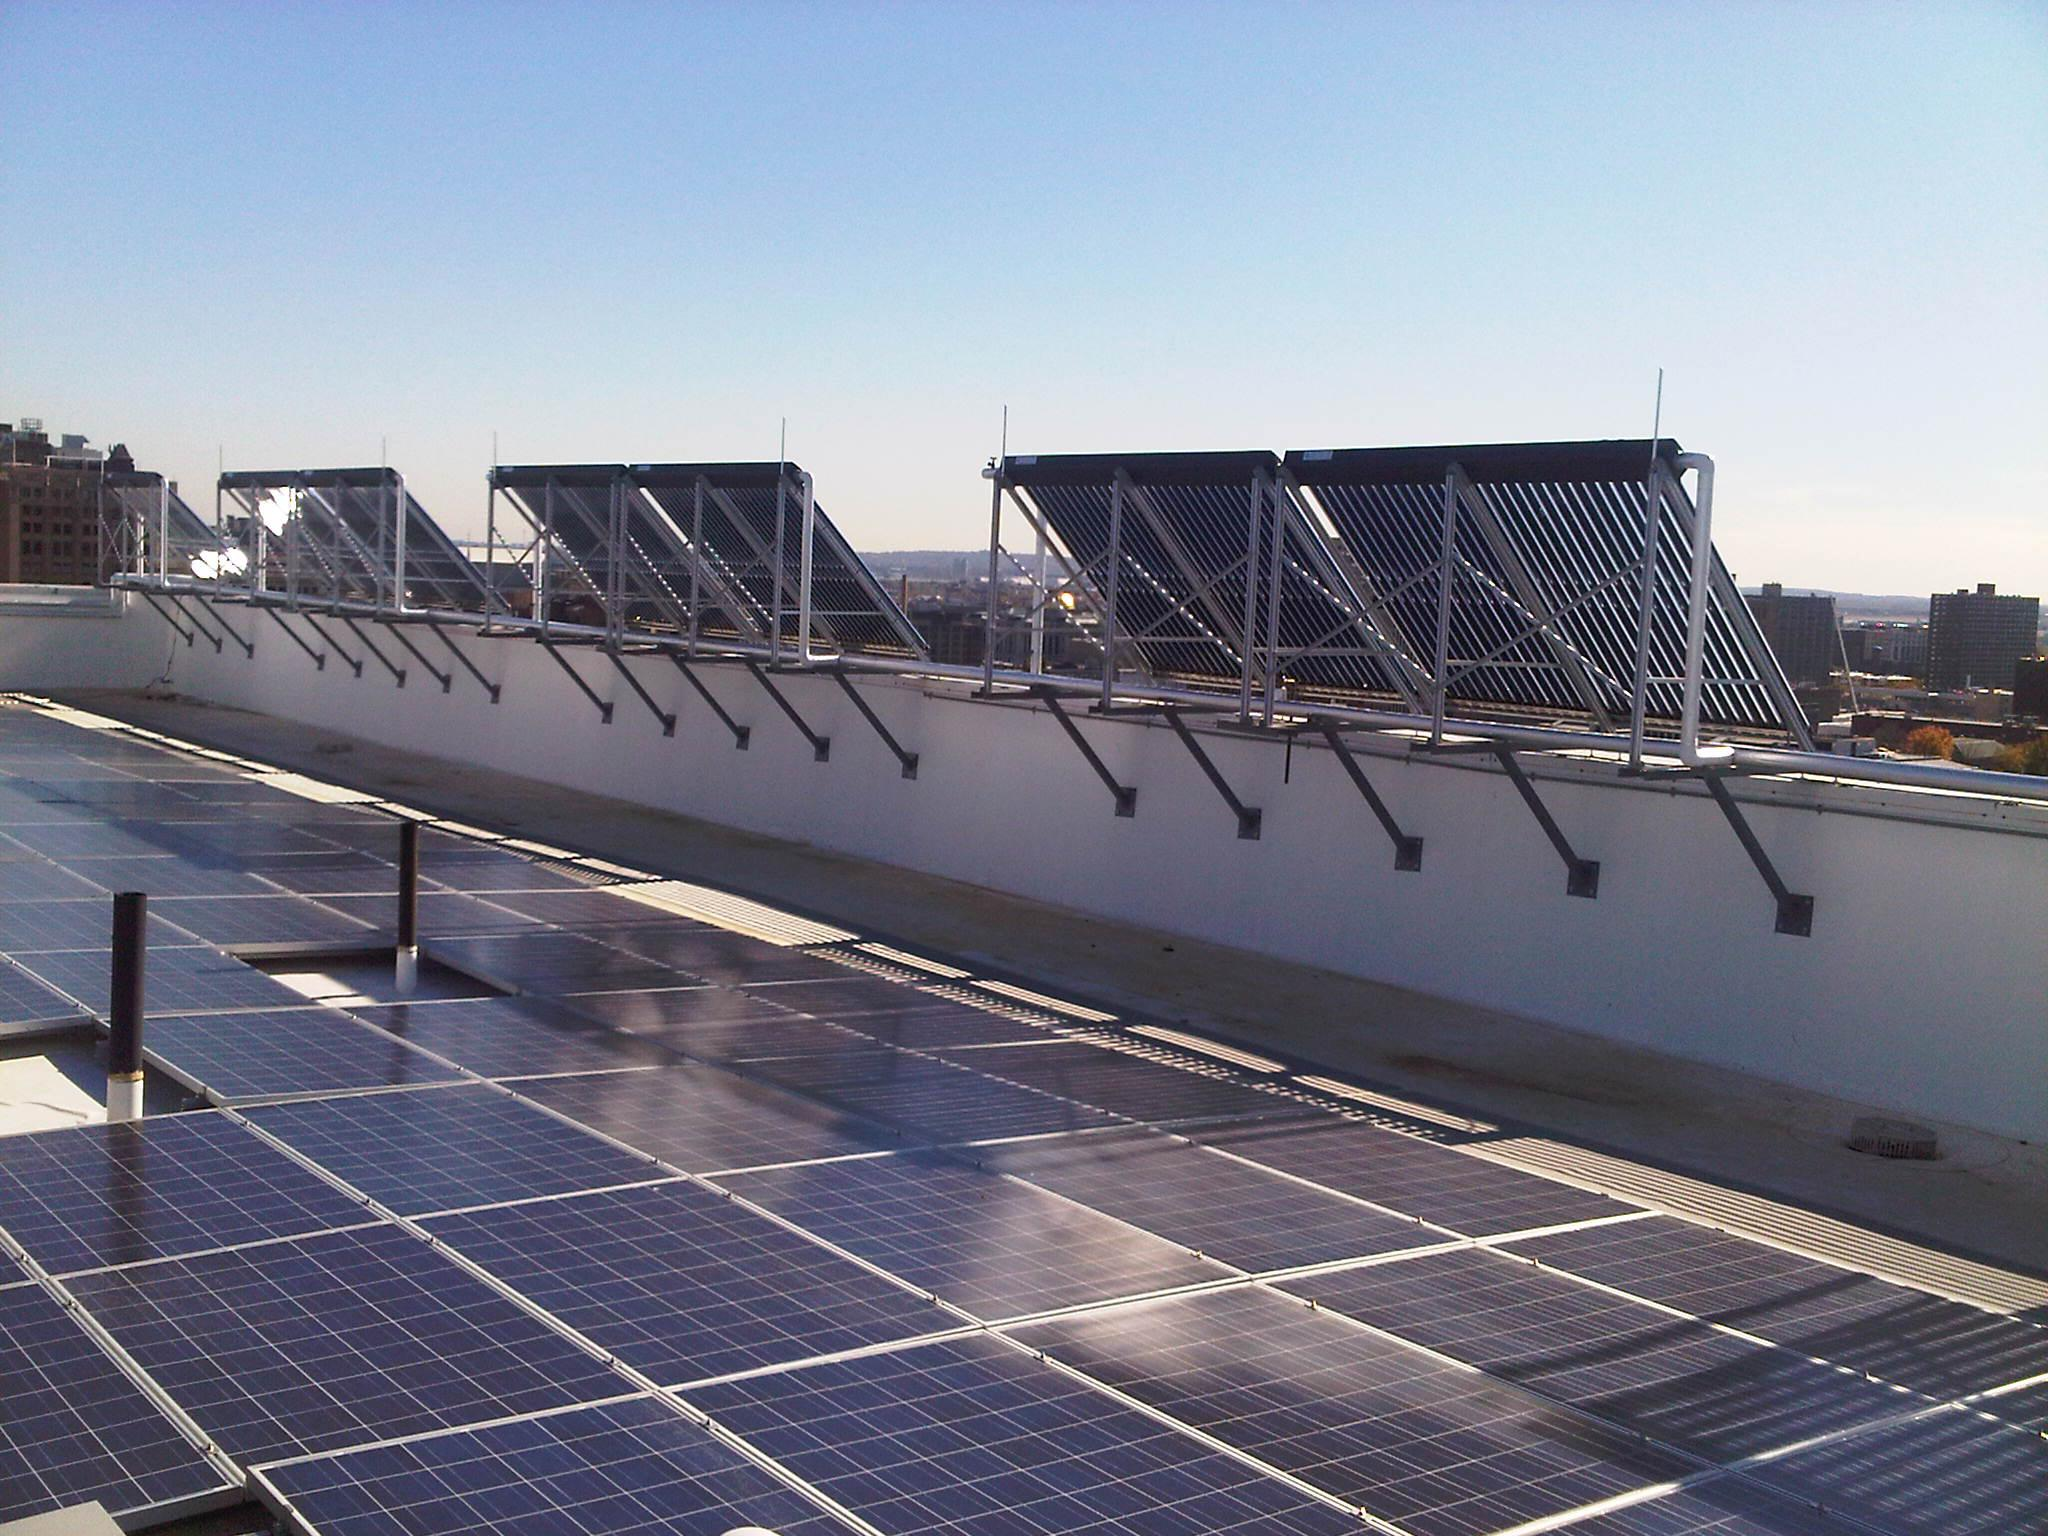 NJIT roof solar collectors